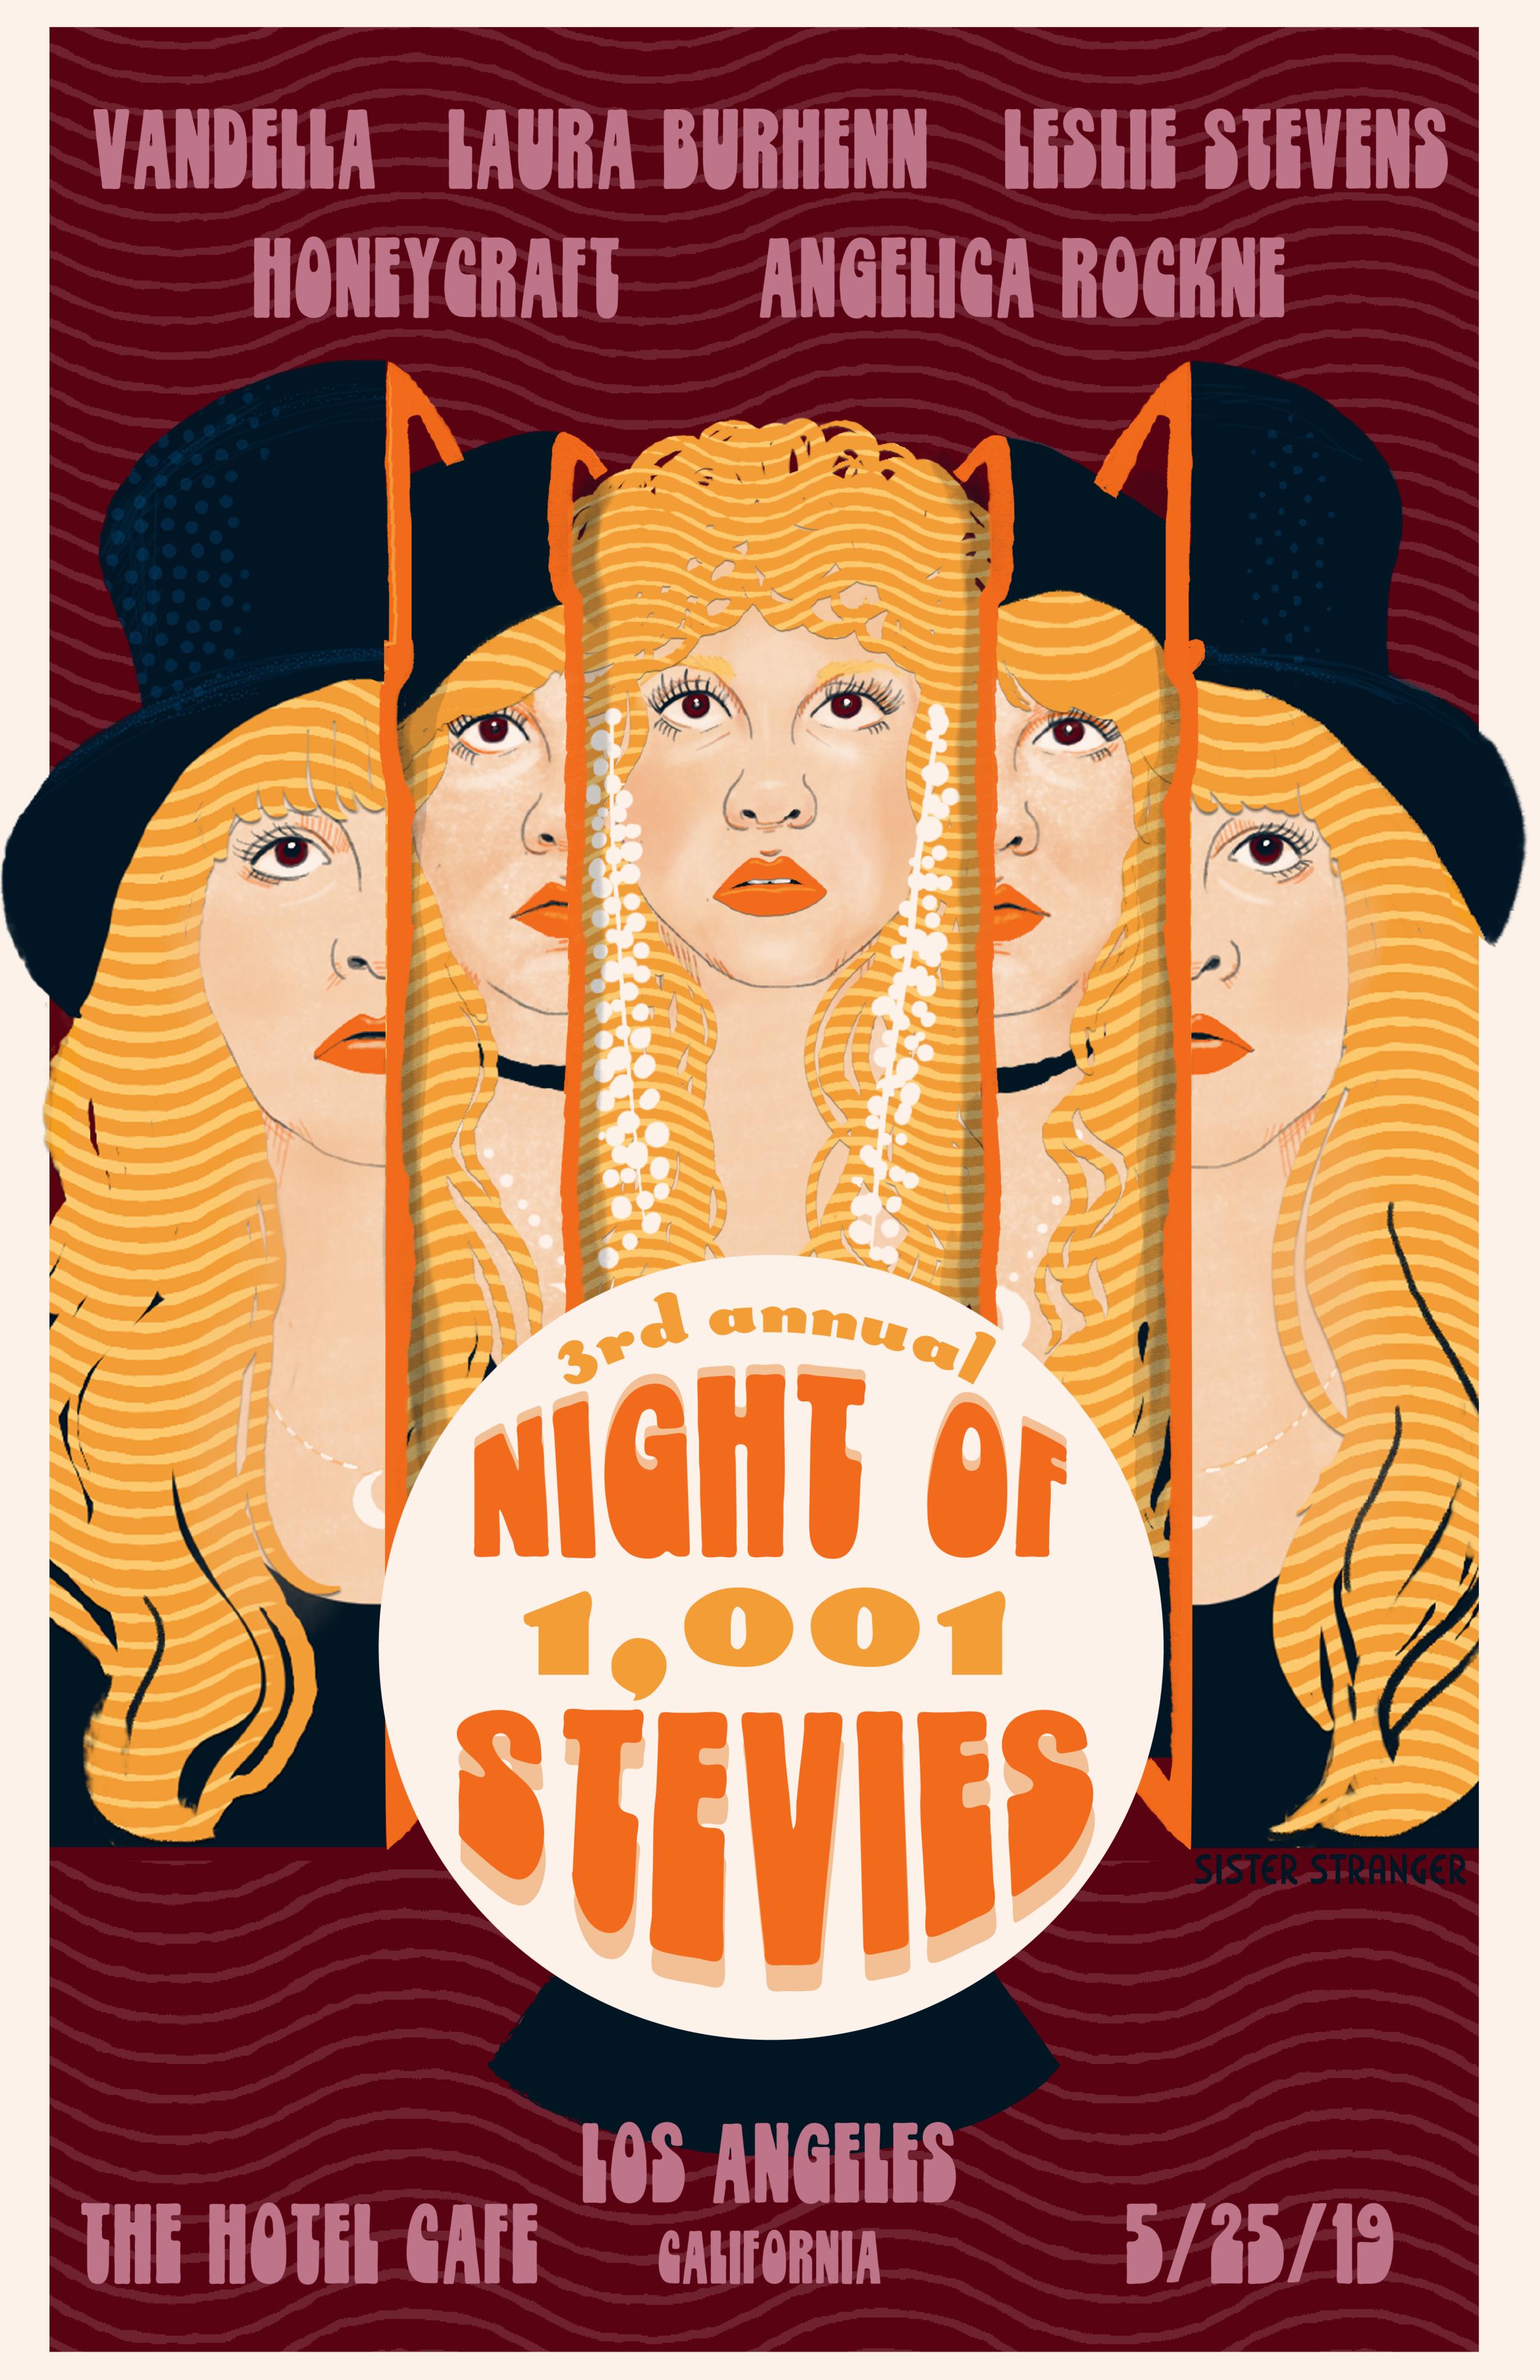 Stevies_poster_LA-01.png